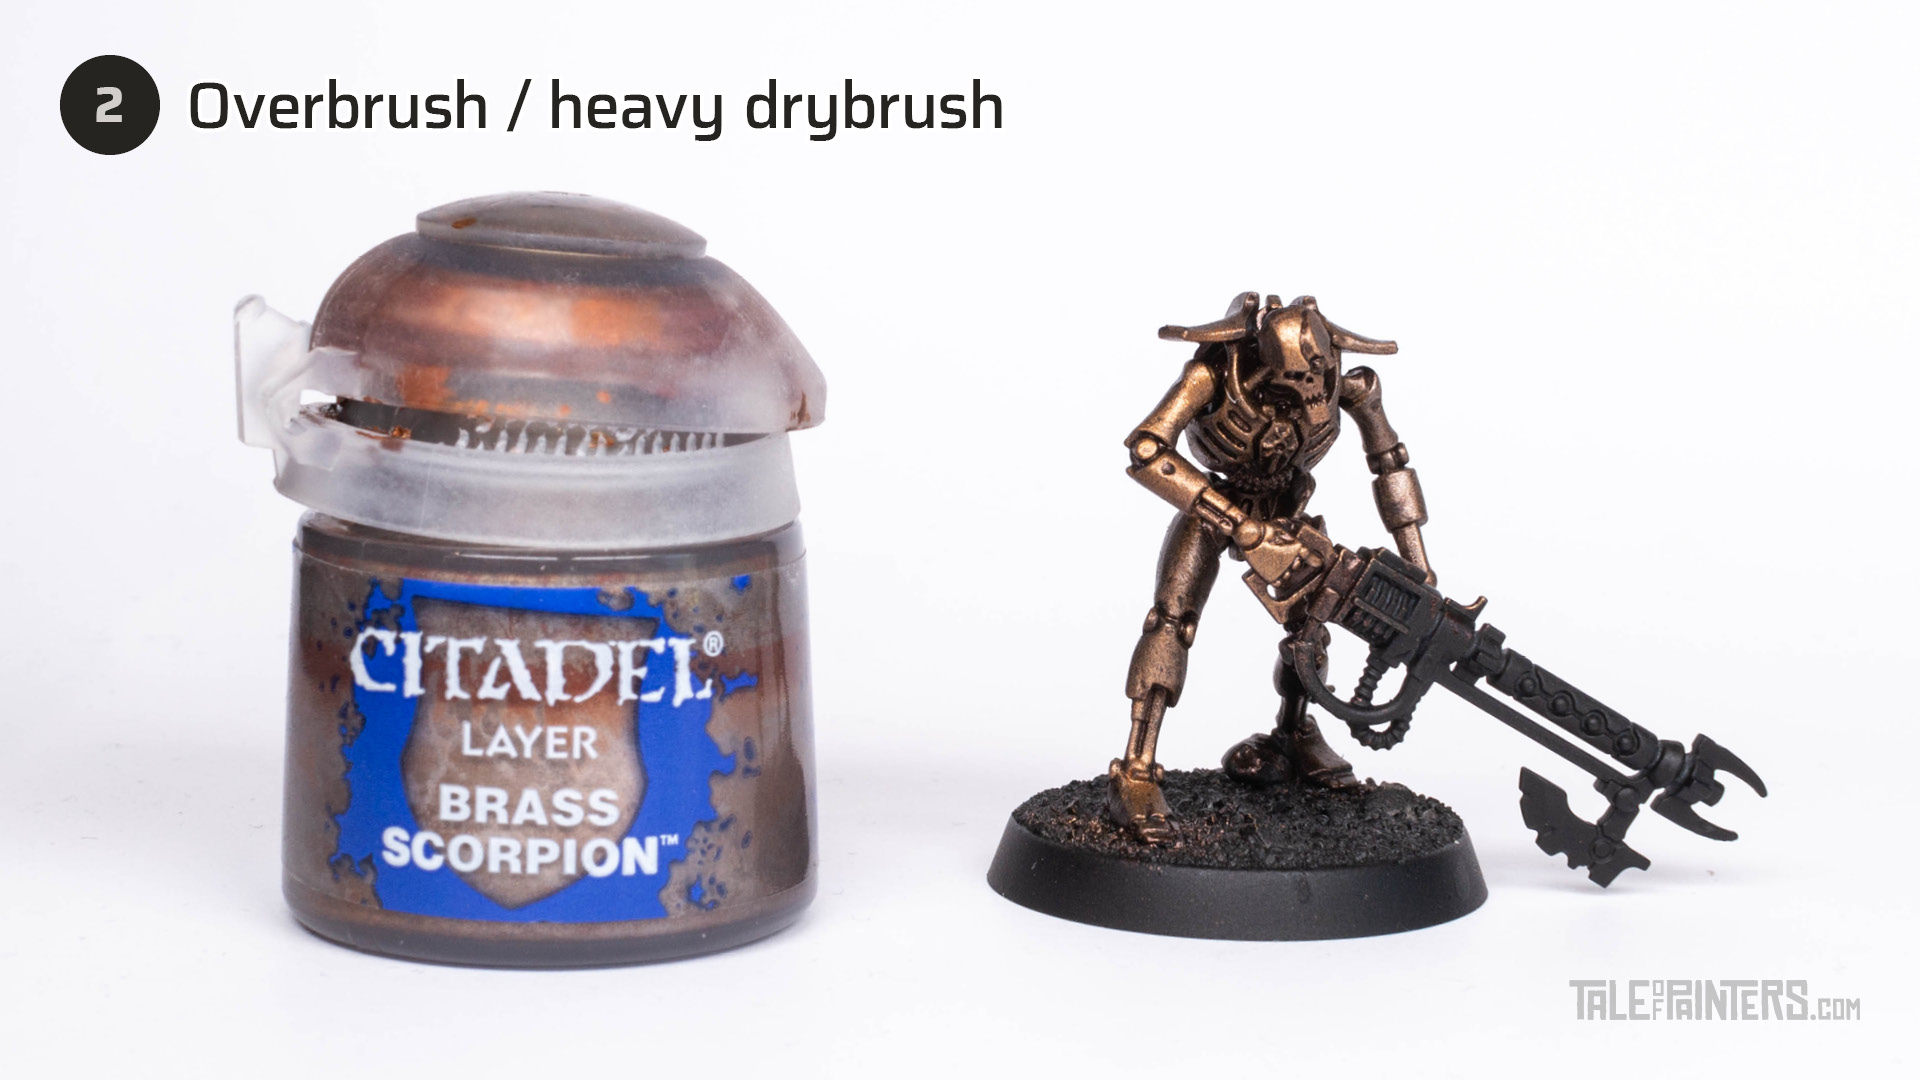 Tutorial: How to paint Necrons Szarekhan armour - step 2